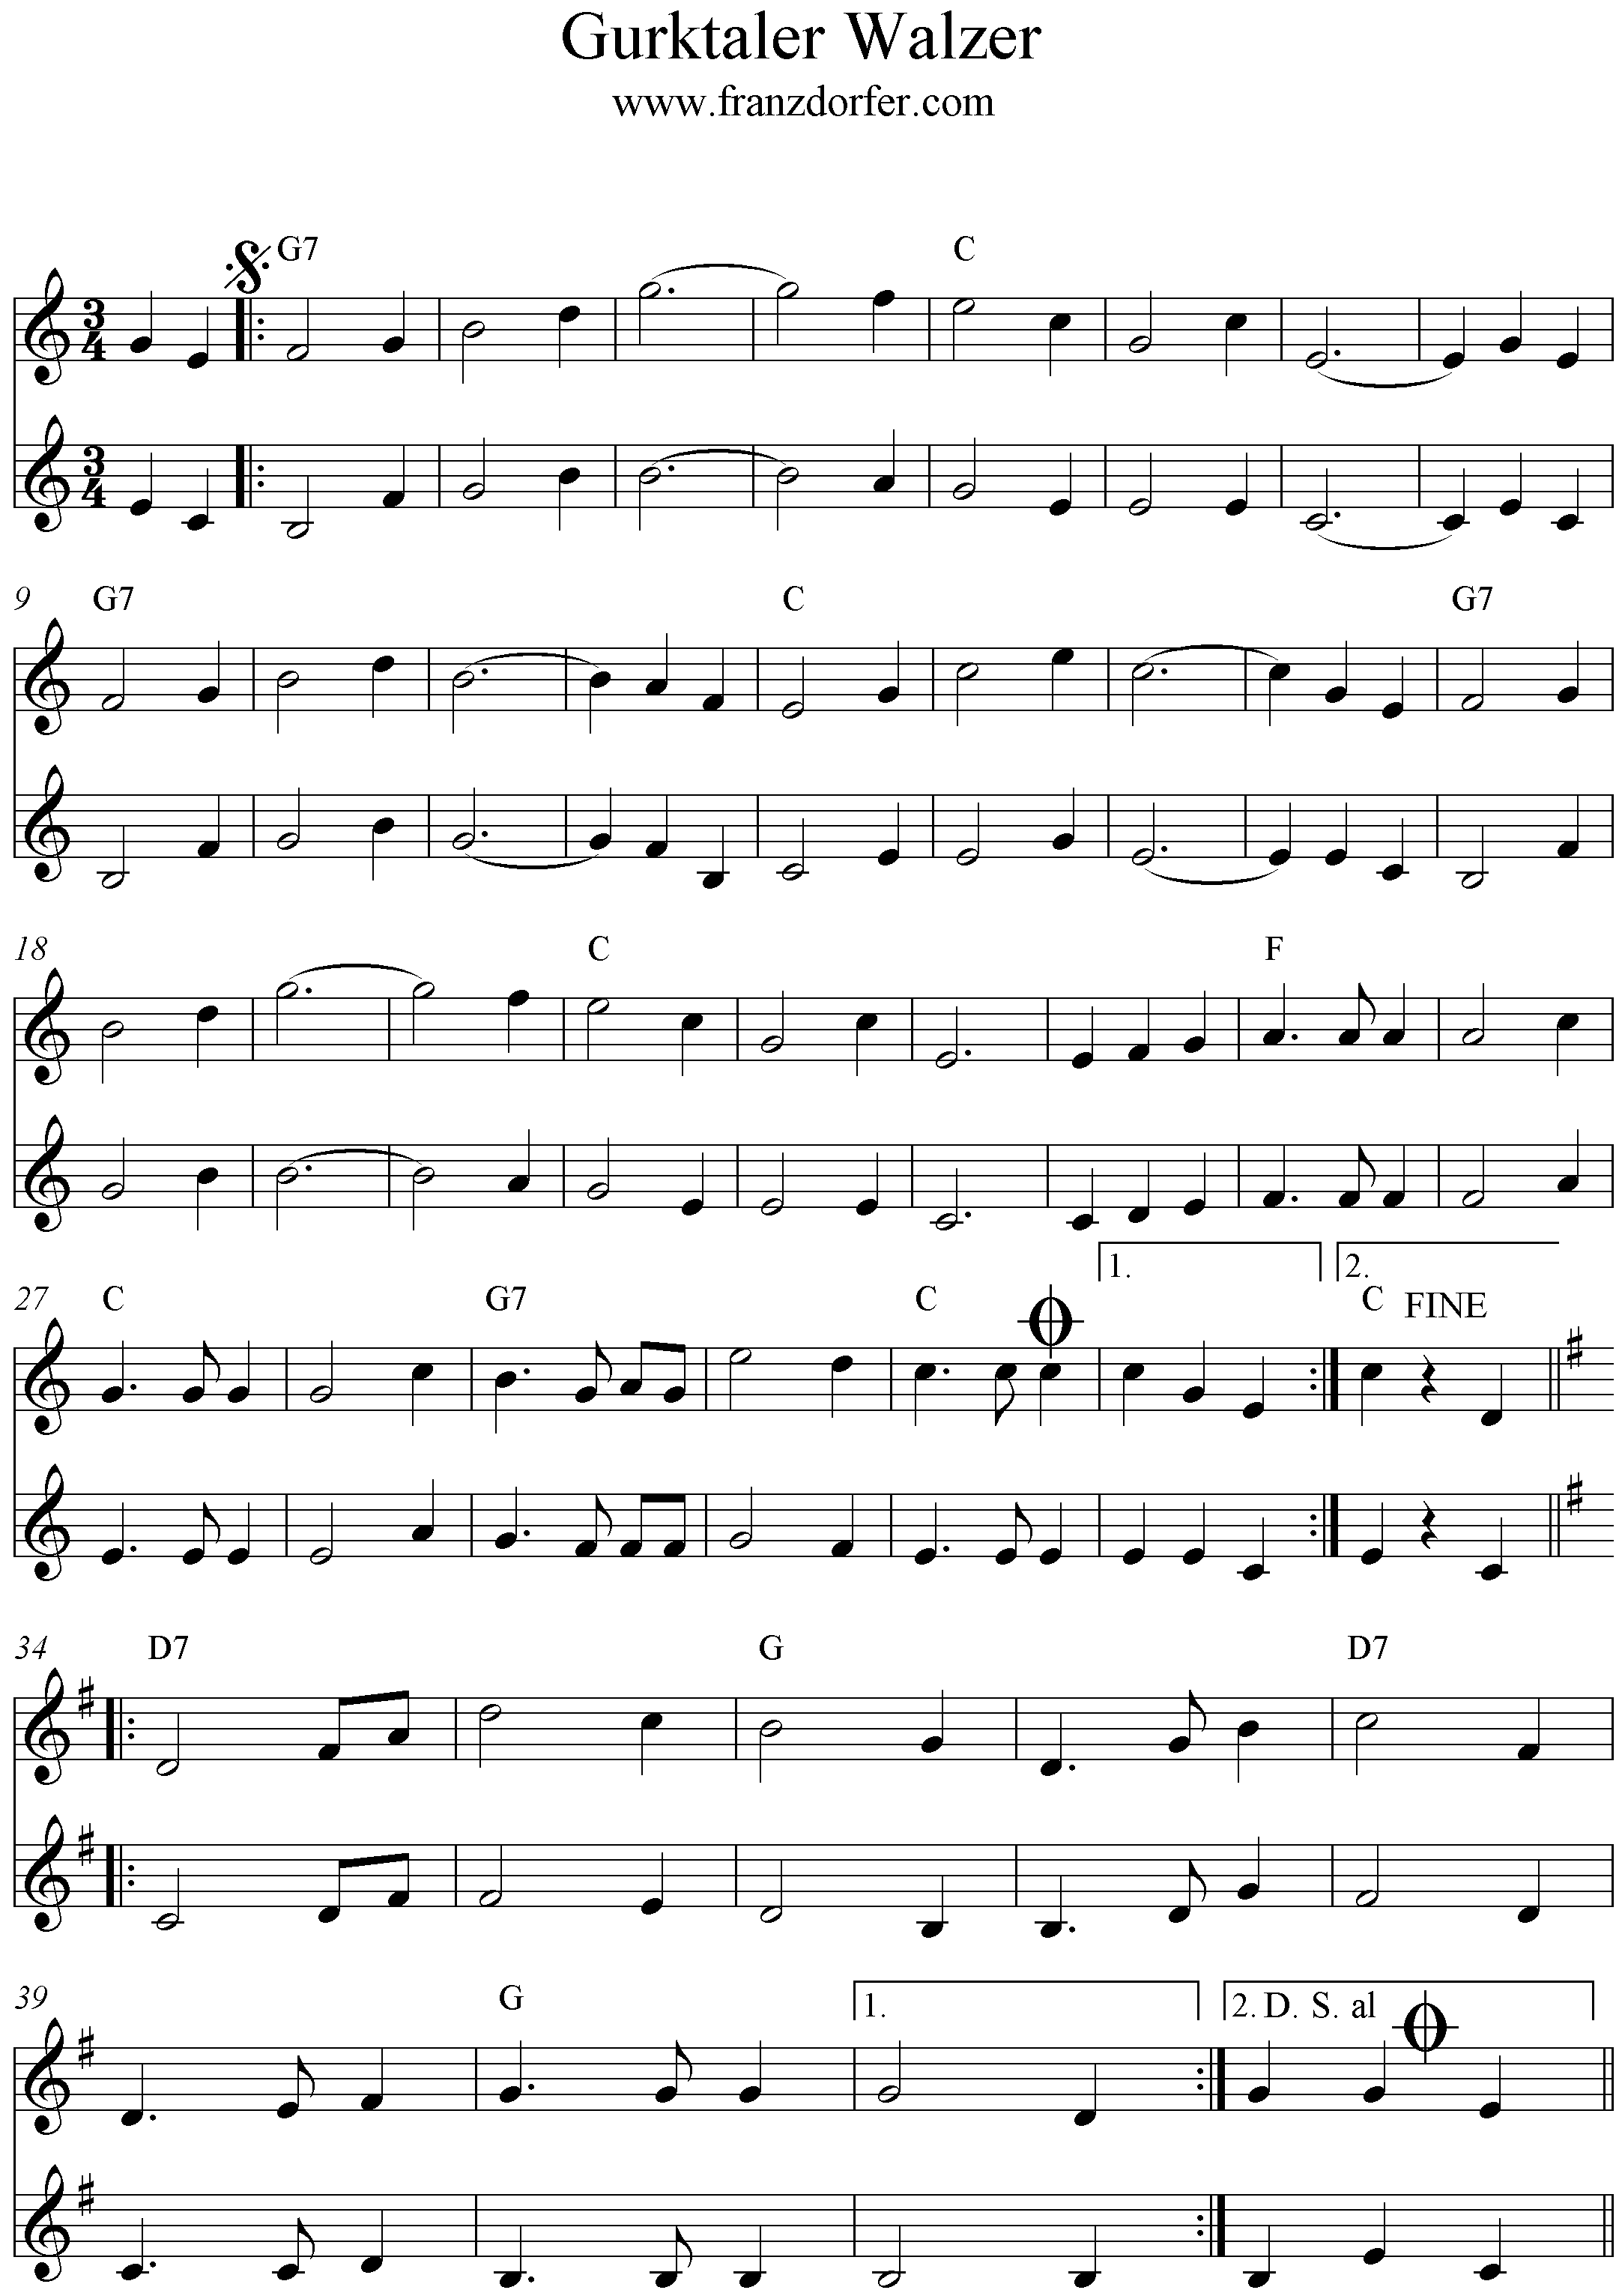 der weltverdruss akkordeon noten